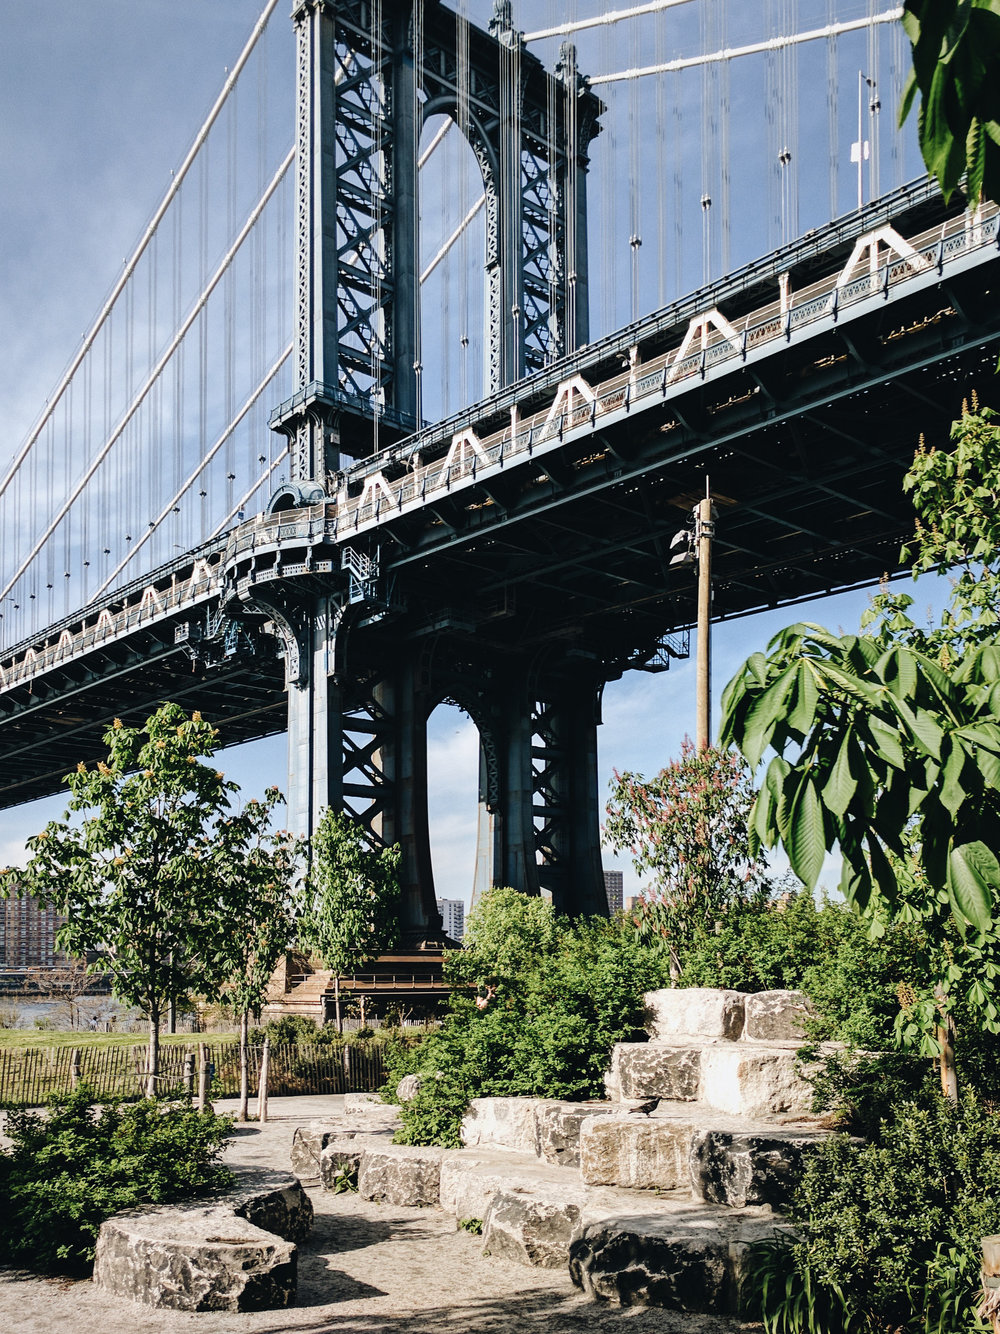 BrooklynBridgePark_1.jpeg